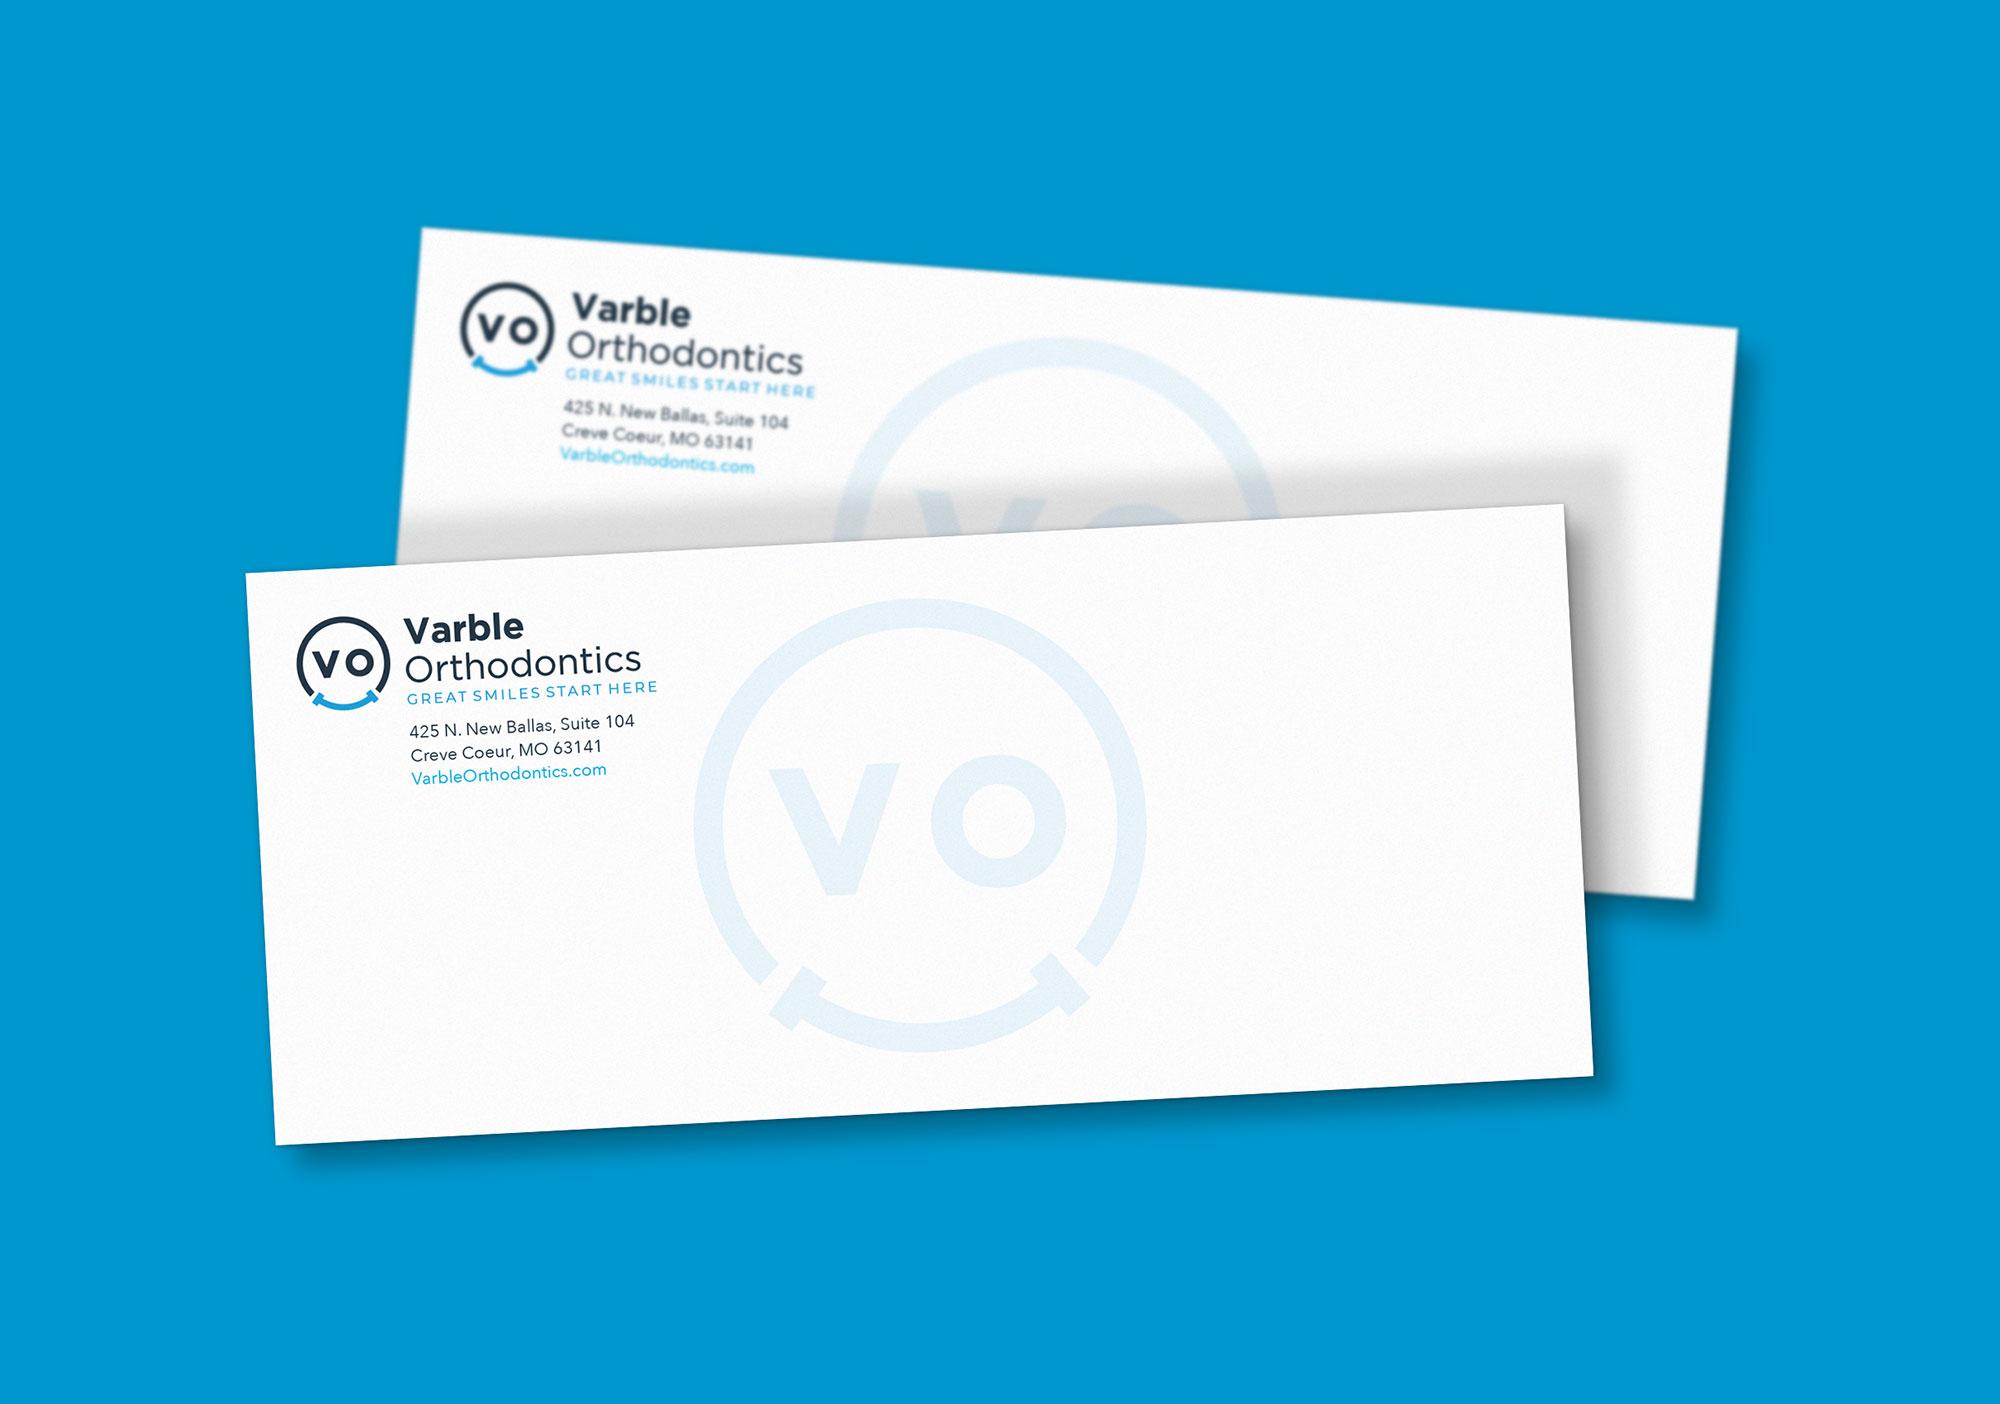 Varble envelopes design